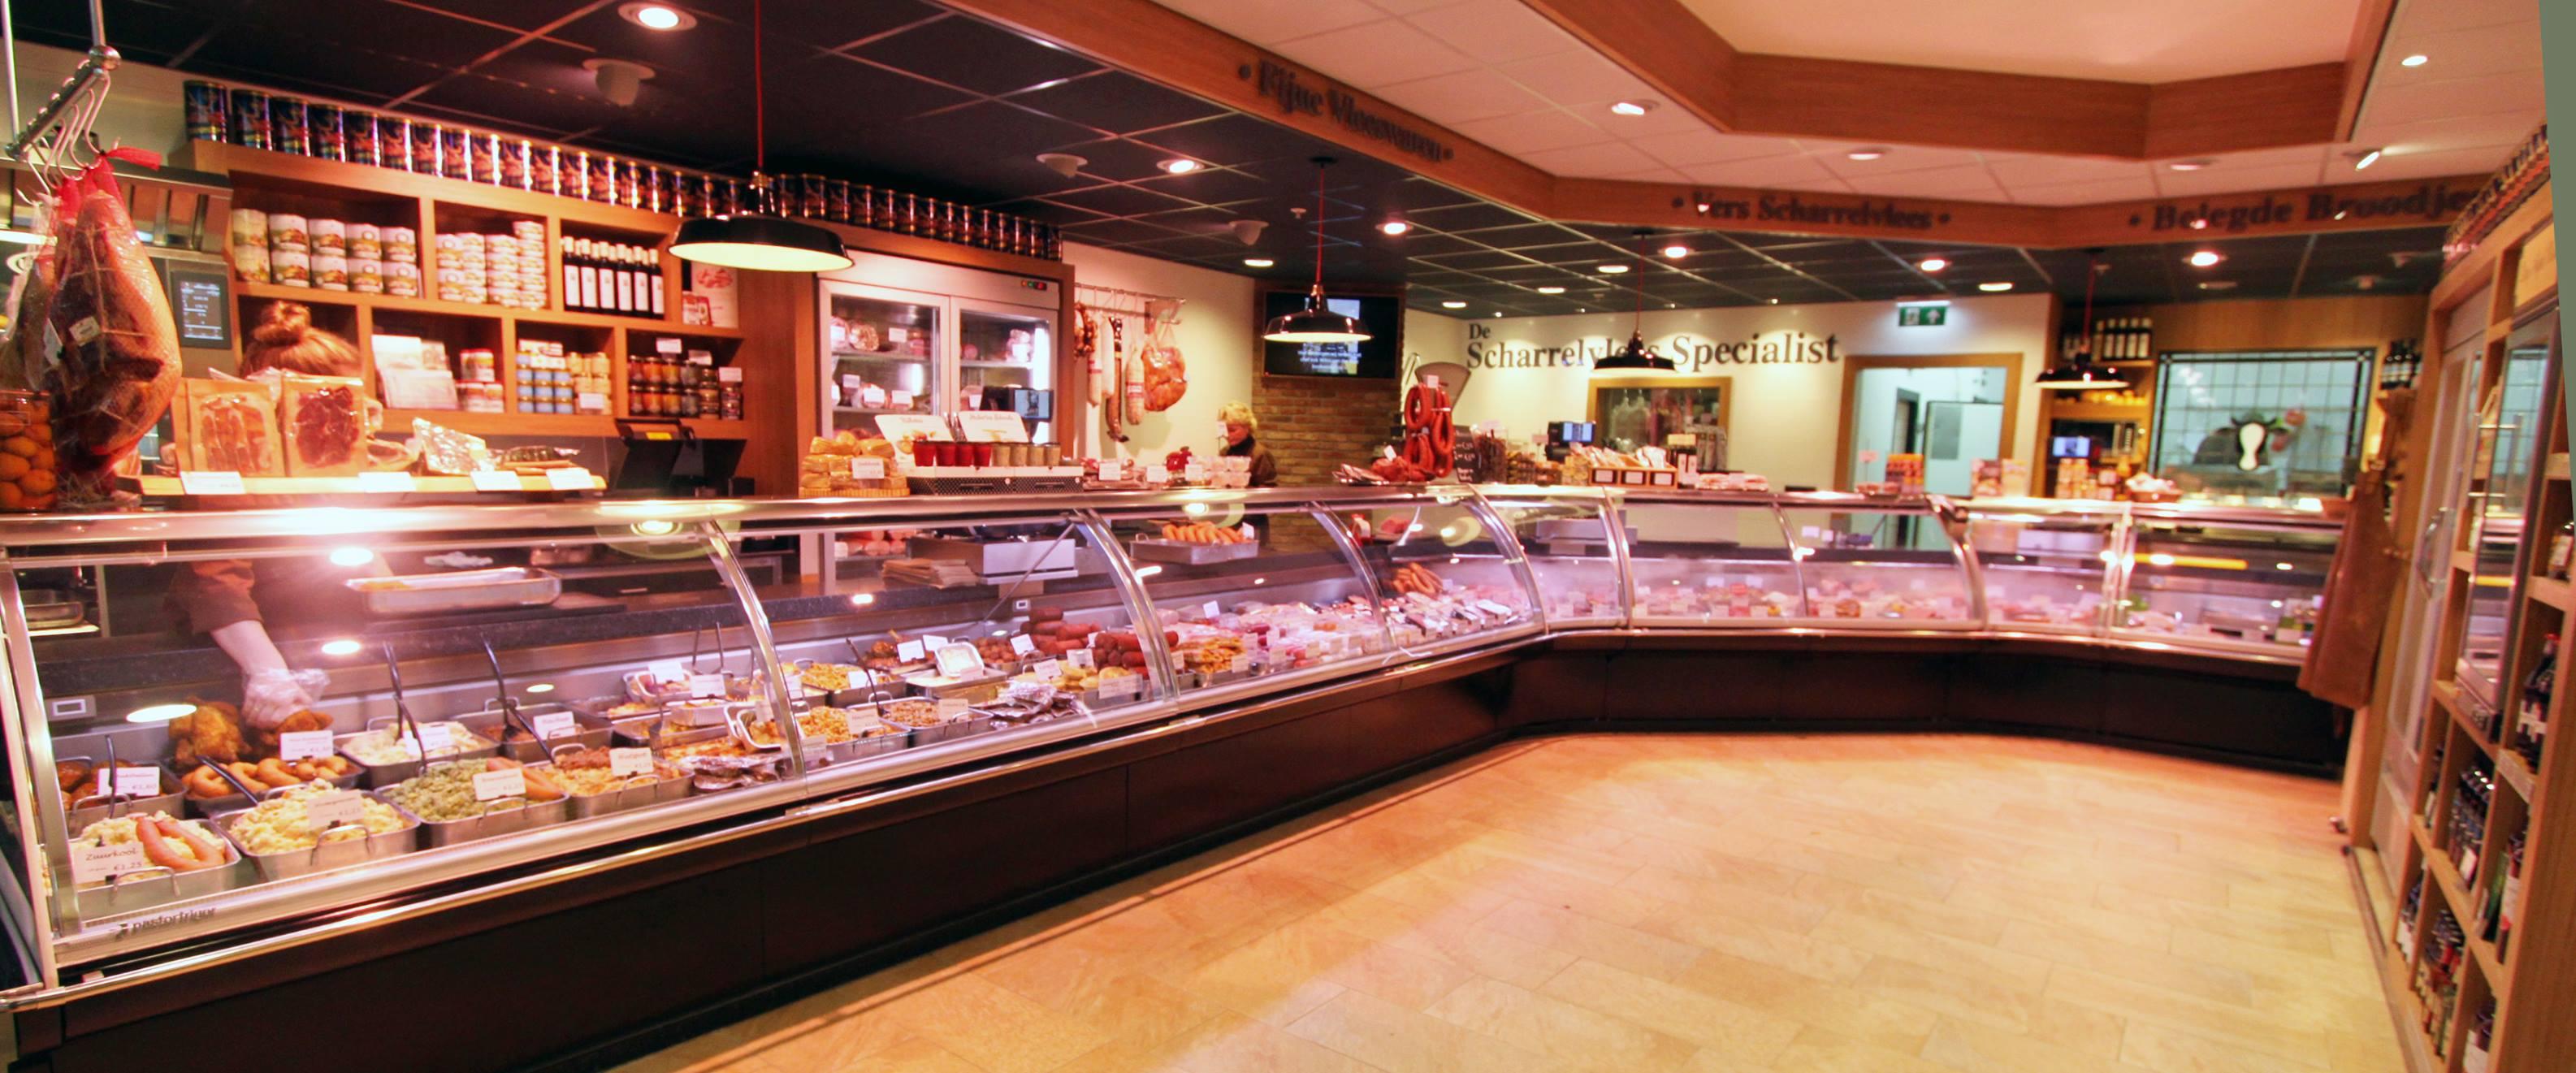 Slagerij Mulder winkel Kerkelanden Hilversum